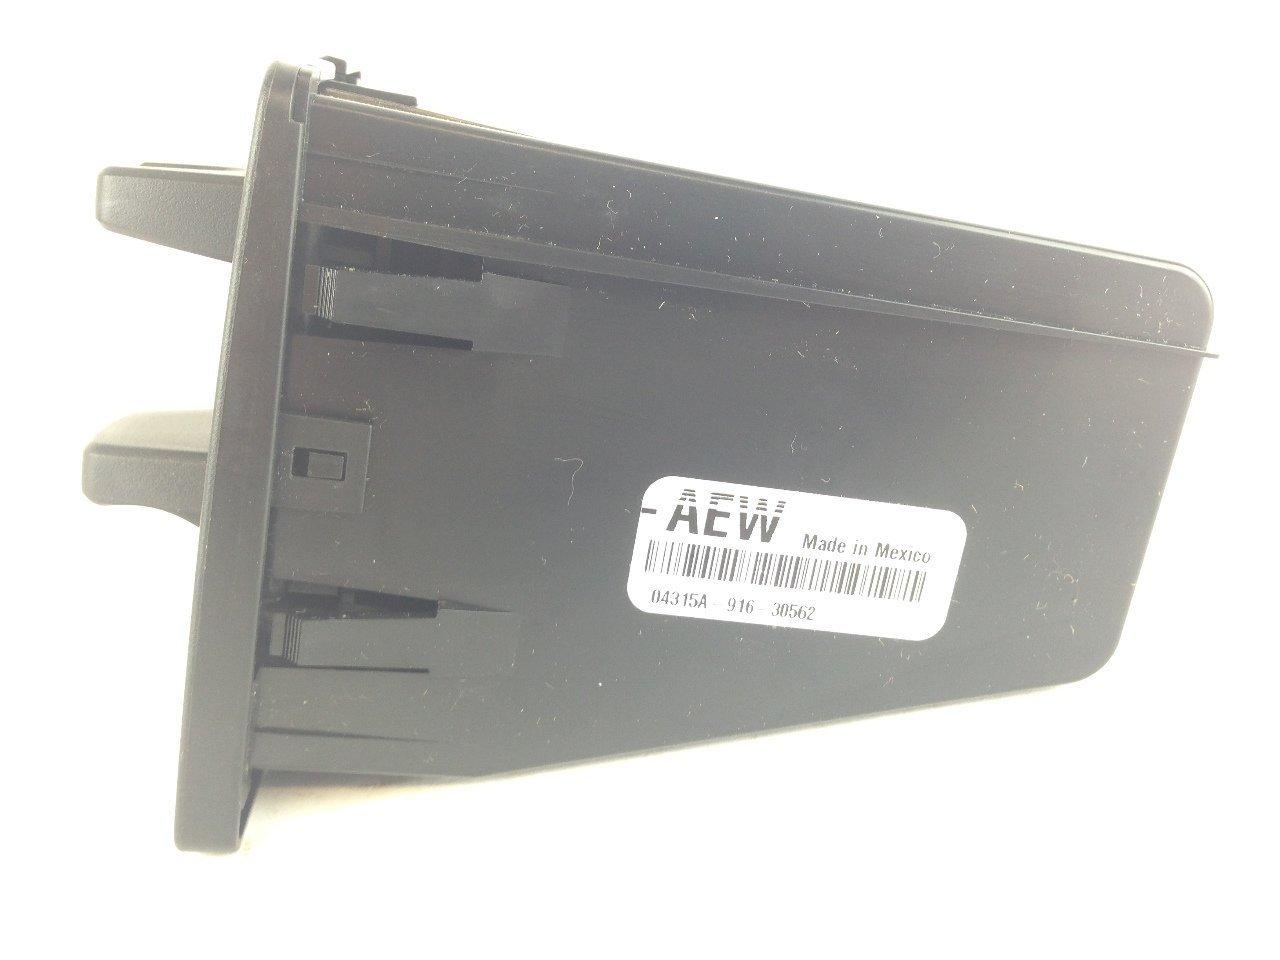 Ford Fl3z 19h332 Aa Part Dash Trailer Brake Control Mounted Electric Controller Wiring Diagram Module Kit Automotive